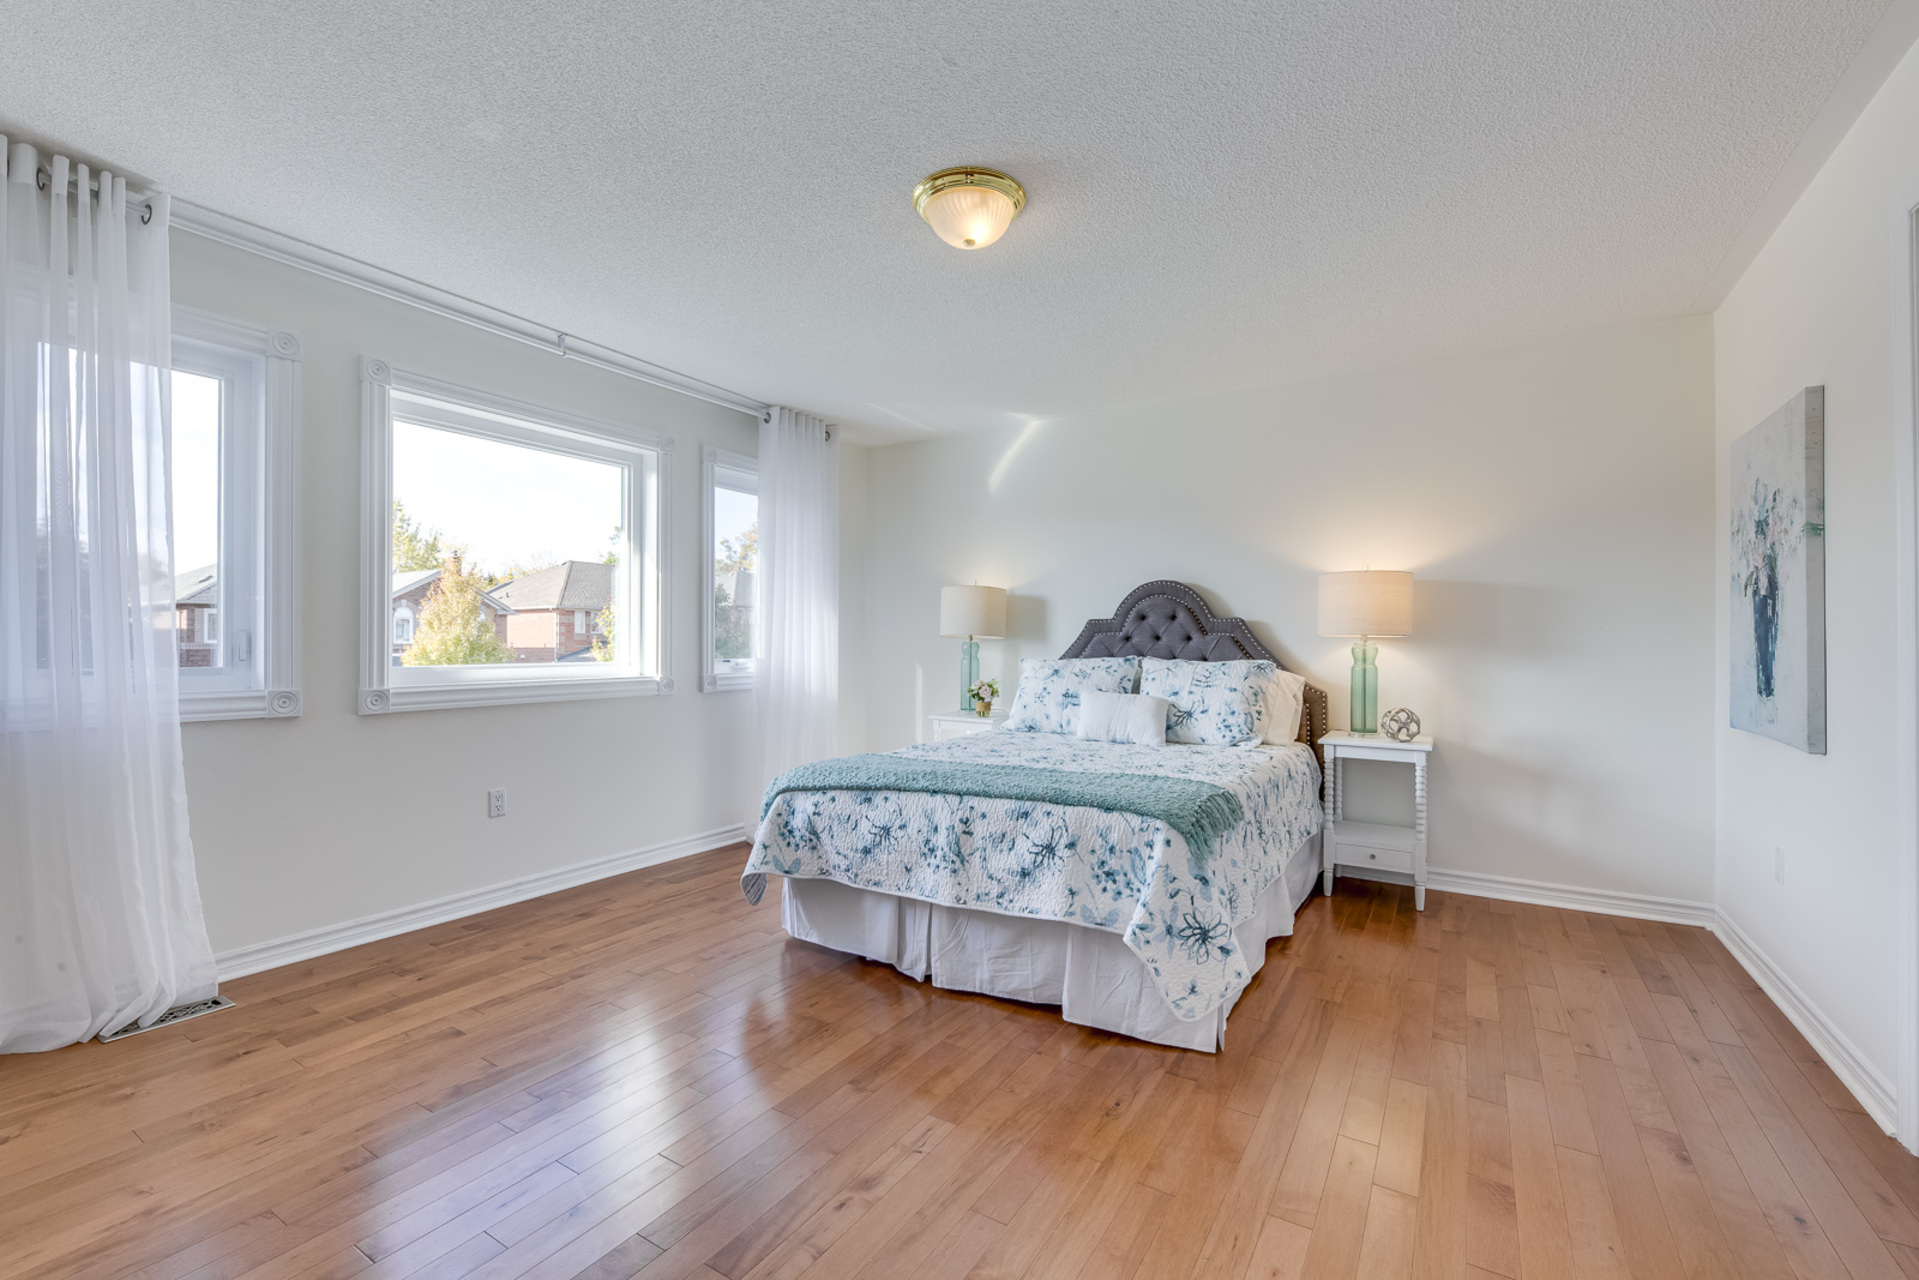 2nd Bedroom - 1806 Glenvista Dr, Oakville - Elite3 & Team at  Glenvista Drive, Iroquois Ridge North, Oakville